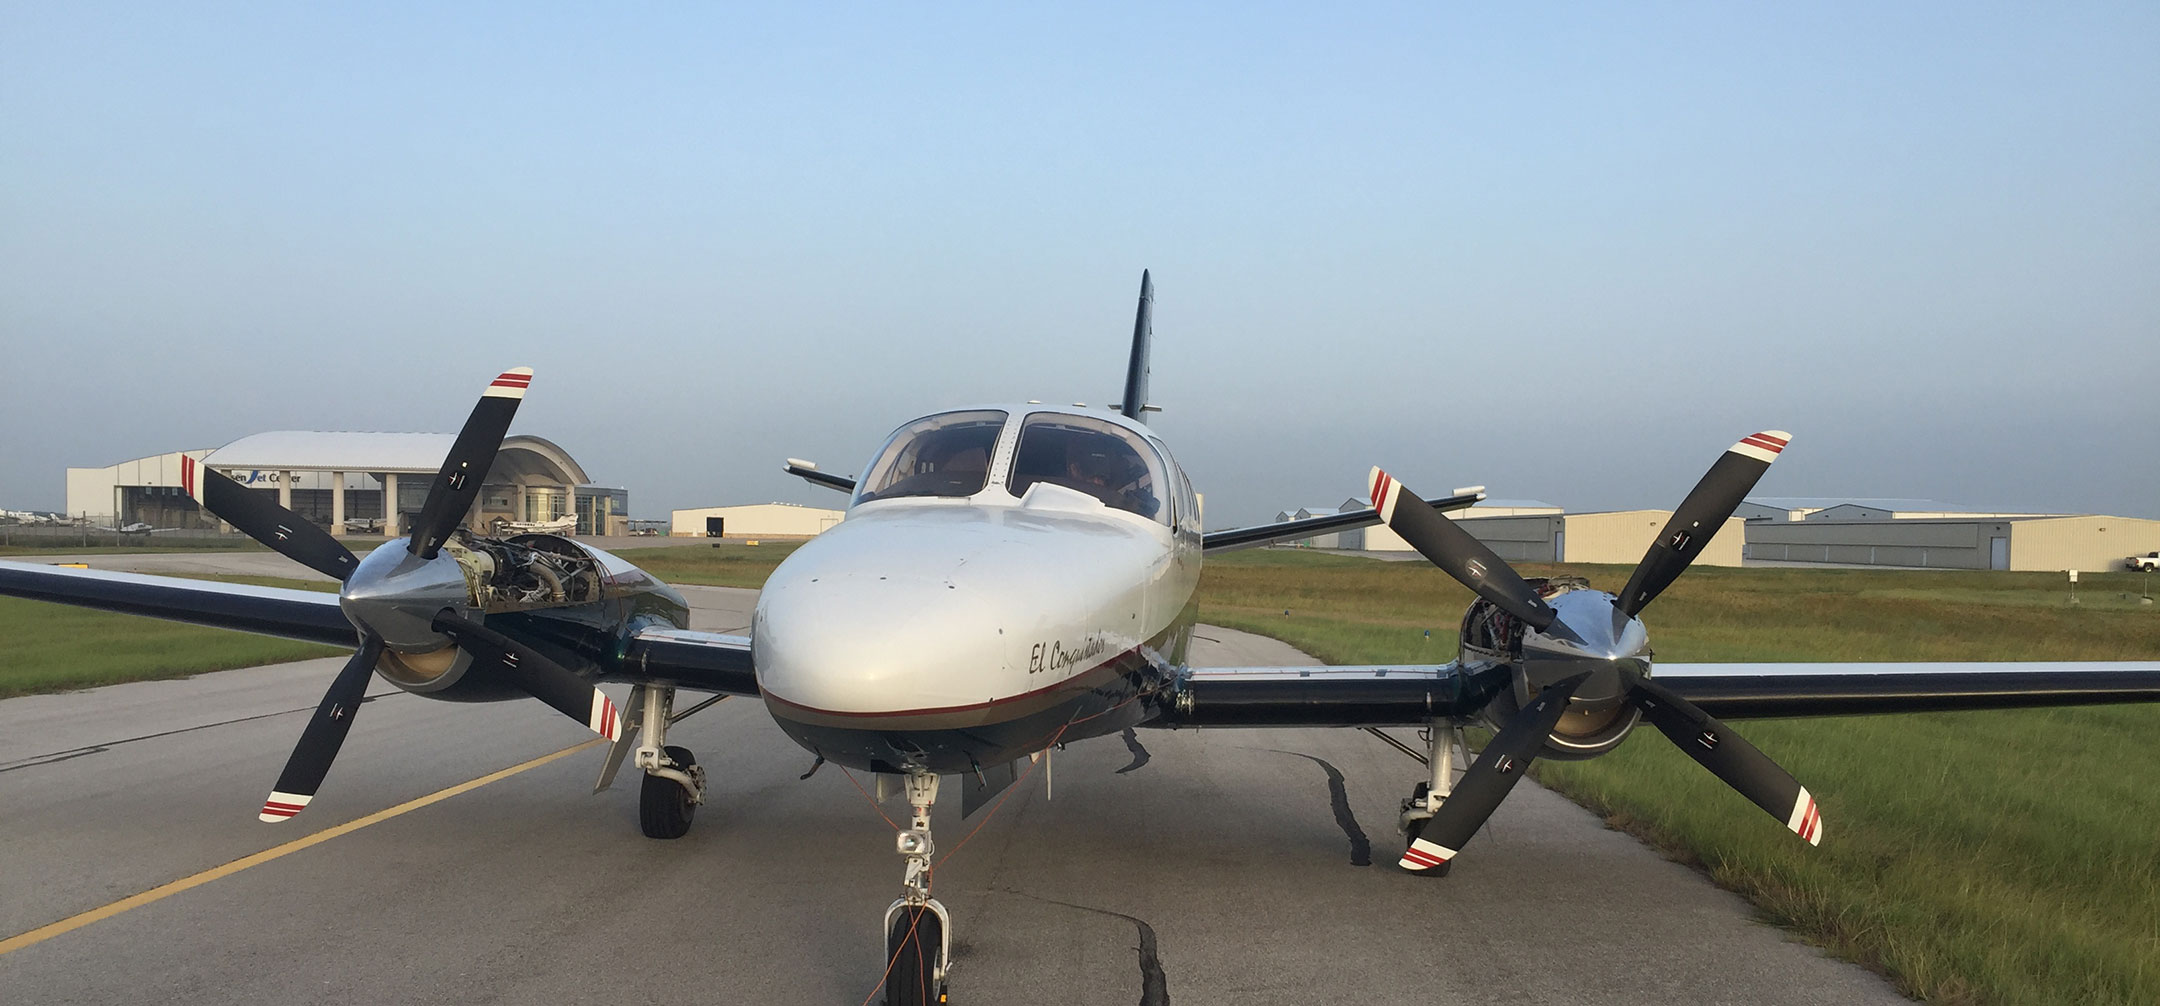 Texas Aircraft Propeller & Accessories   Pearland, TX